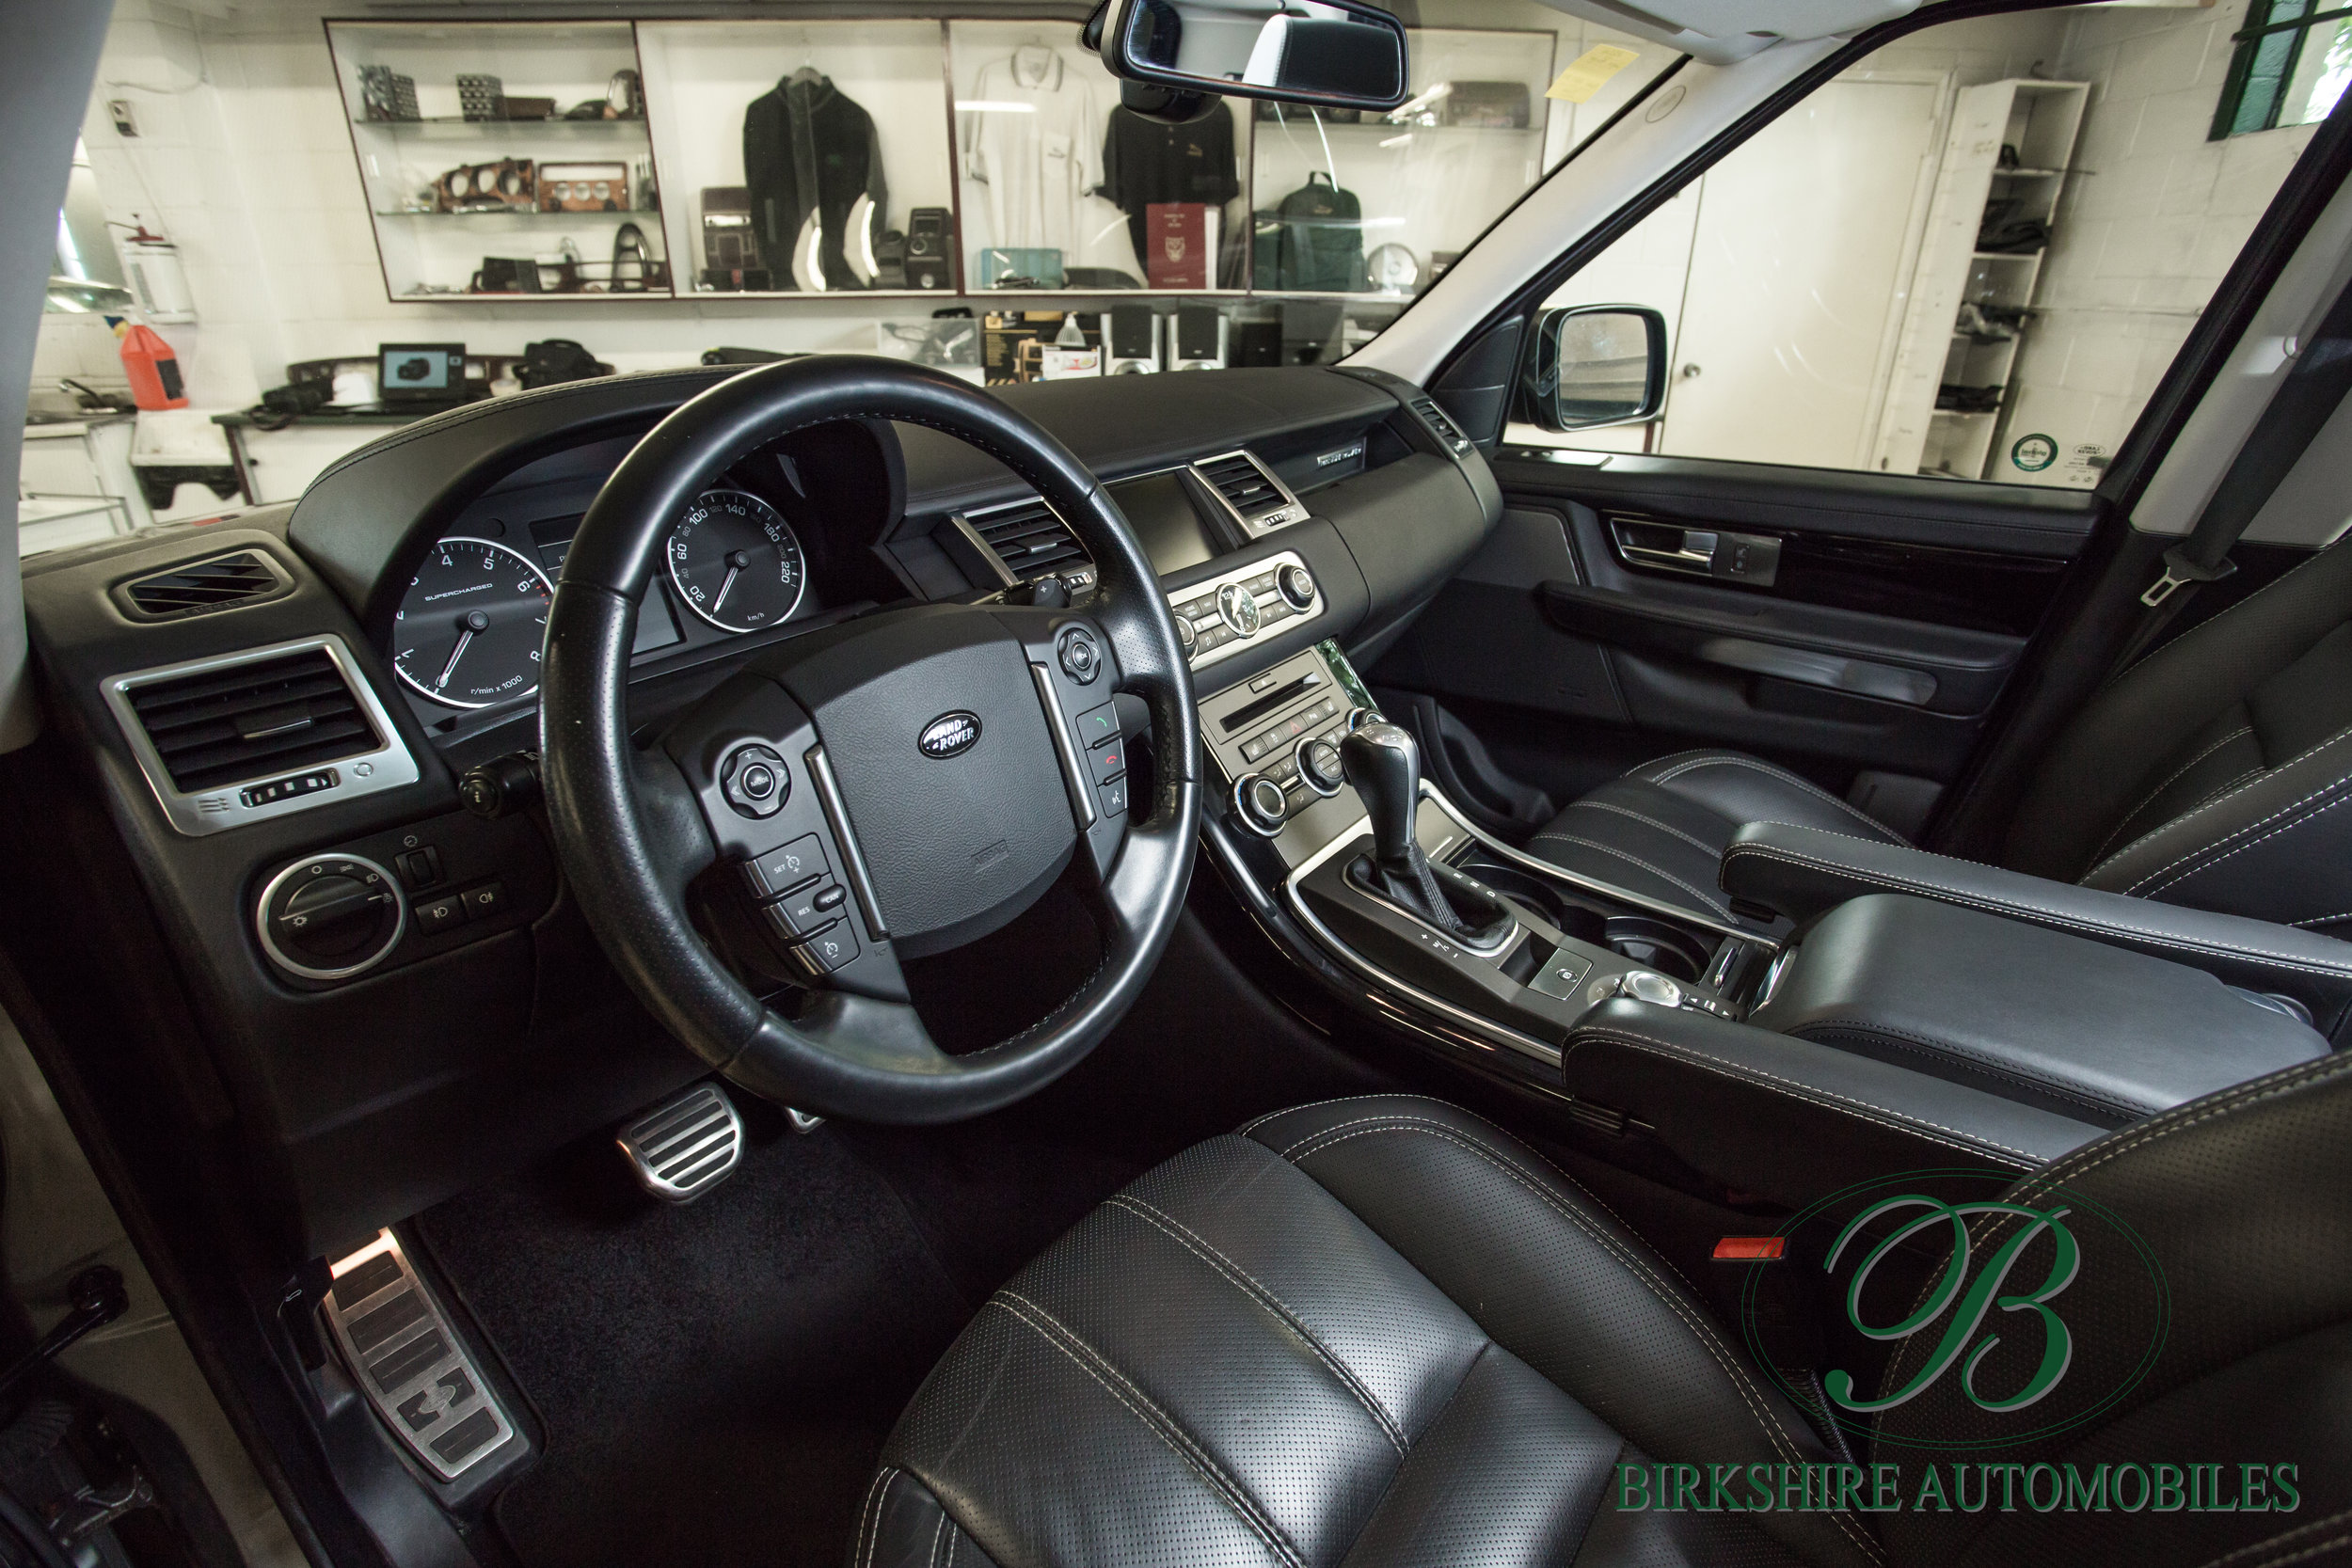 Birkshire Automobiles-15.jpg